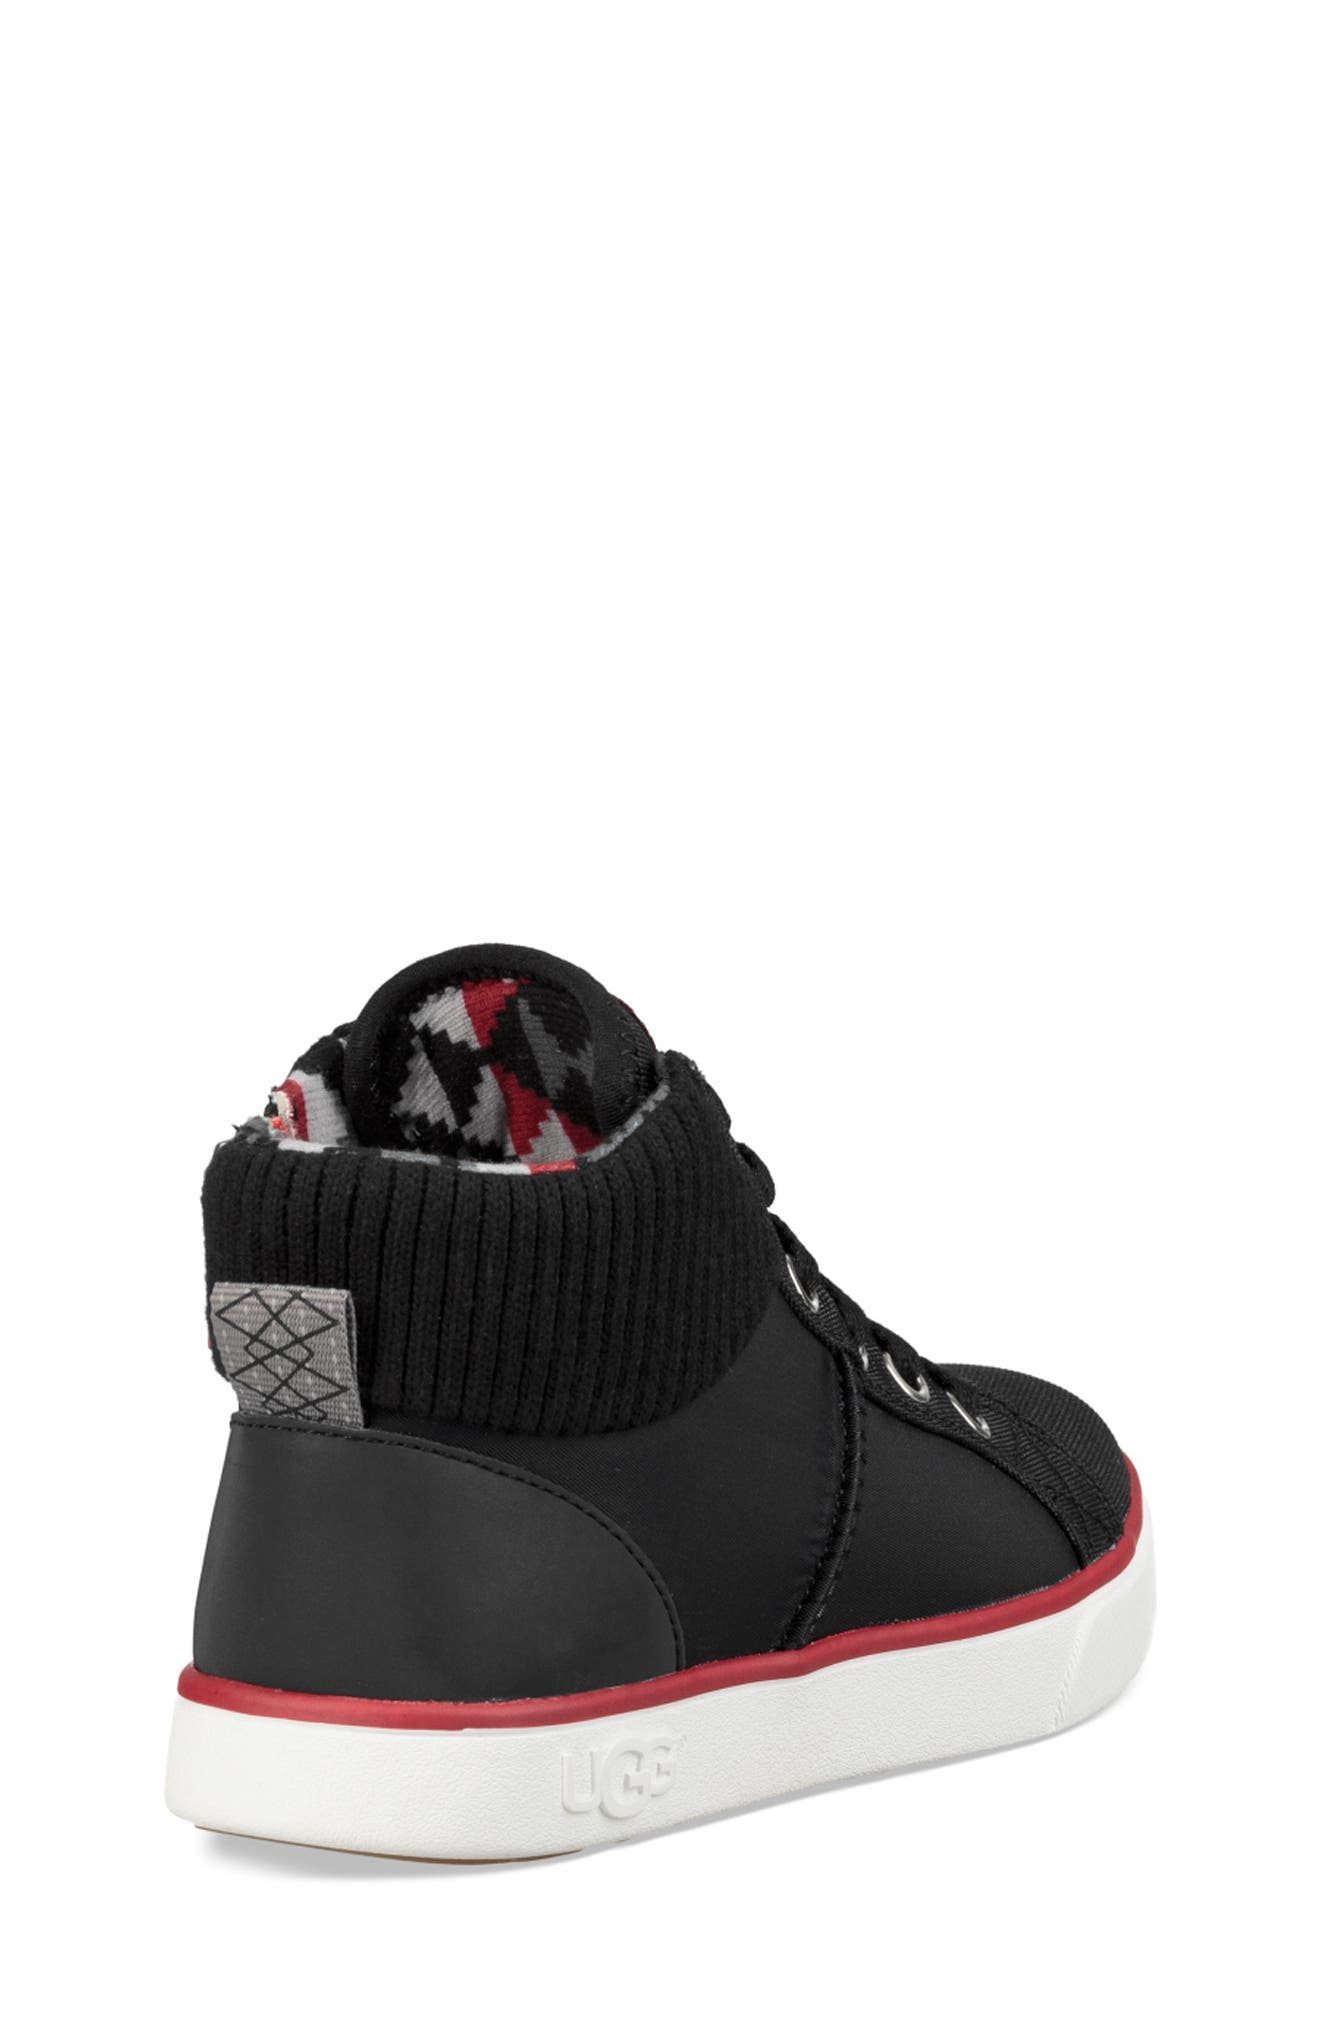 UGG<SUP>®</SUP>, Boscoe Sneaker, Alternate thumbnail 2, color, 001